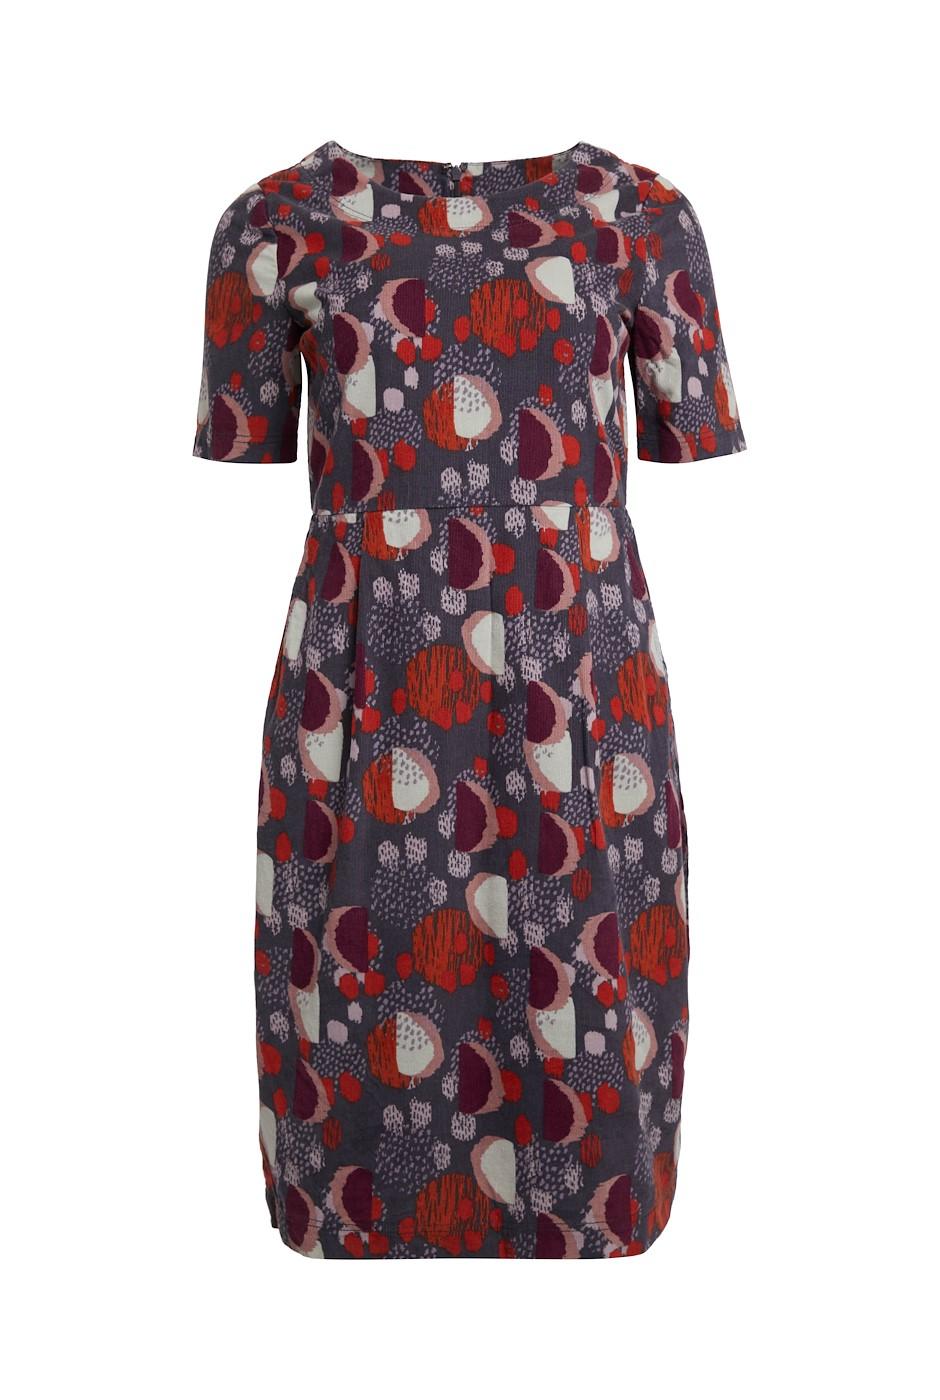 Mirei Printed Cord Dress Charcoal